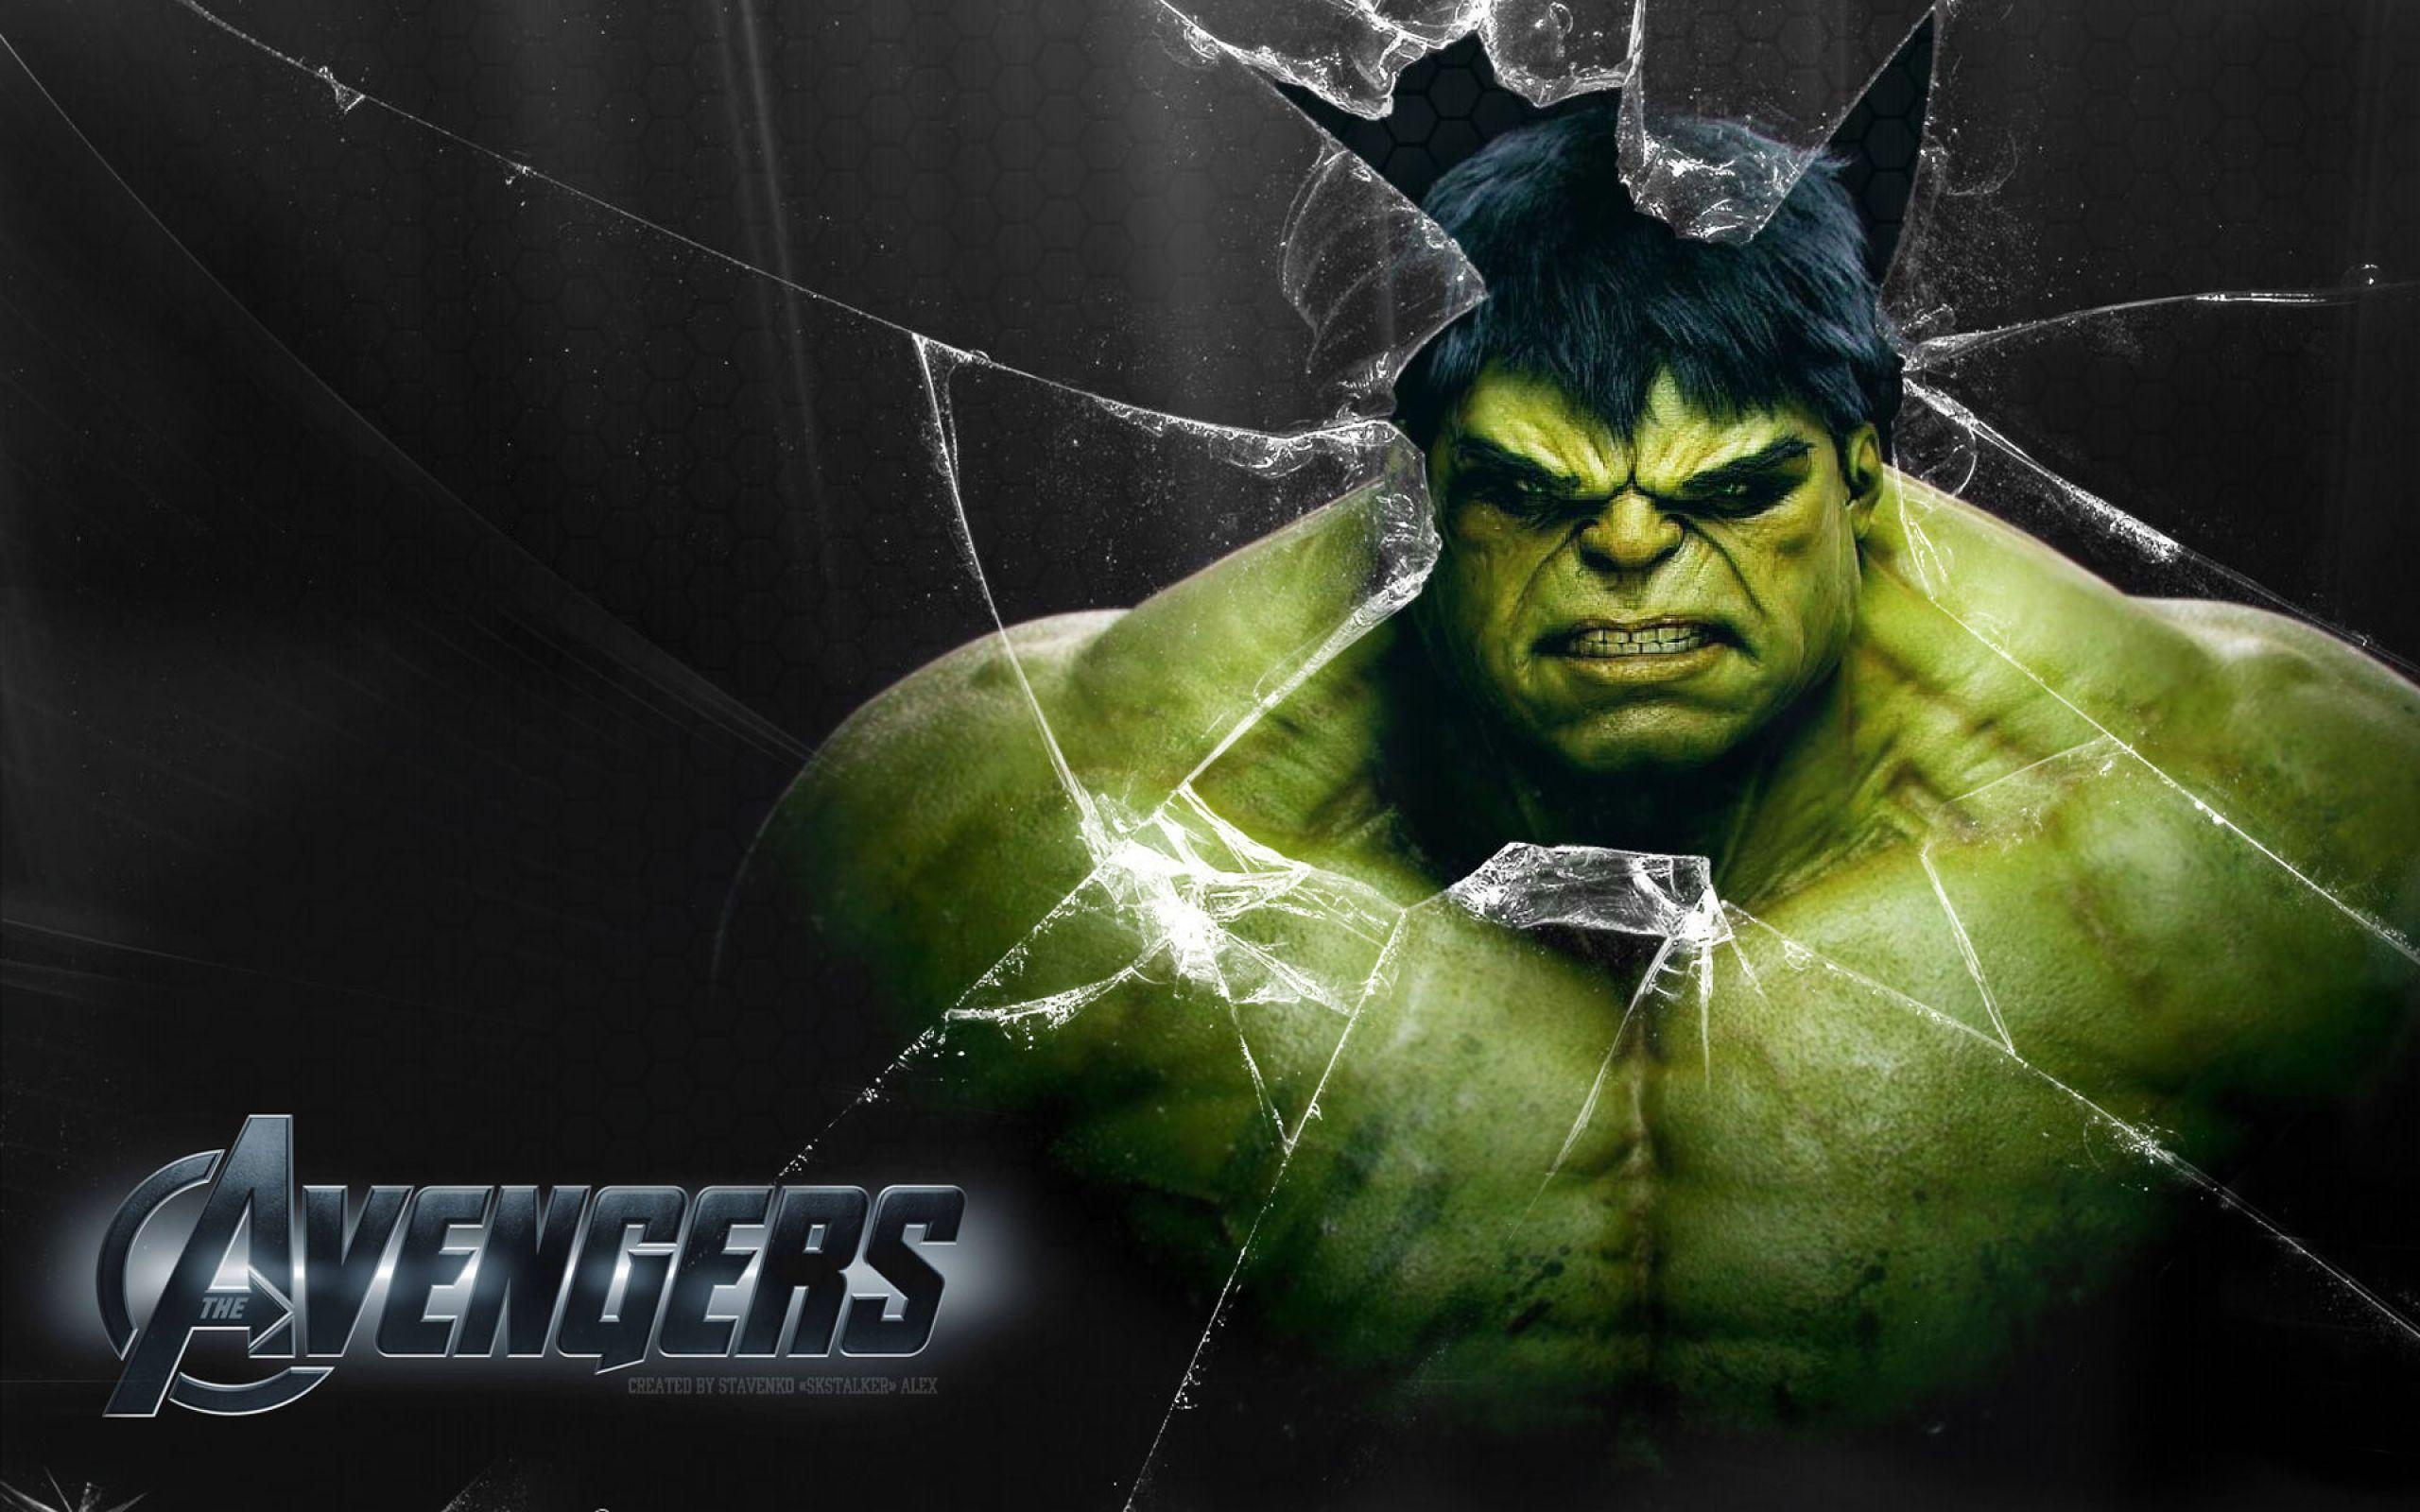 hulk wallpapers full hd wallpaper search